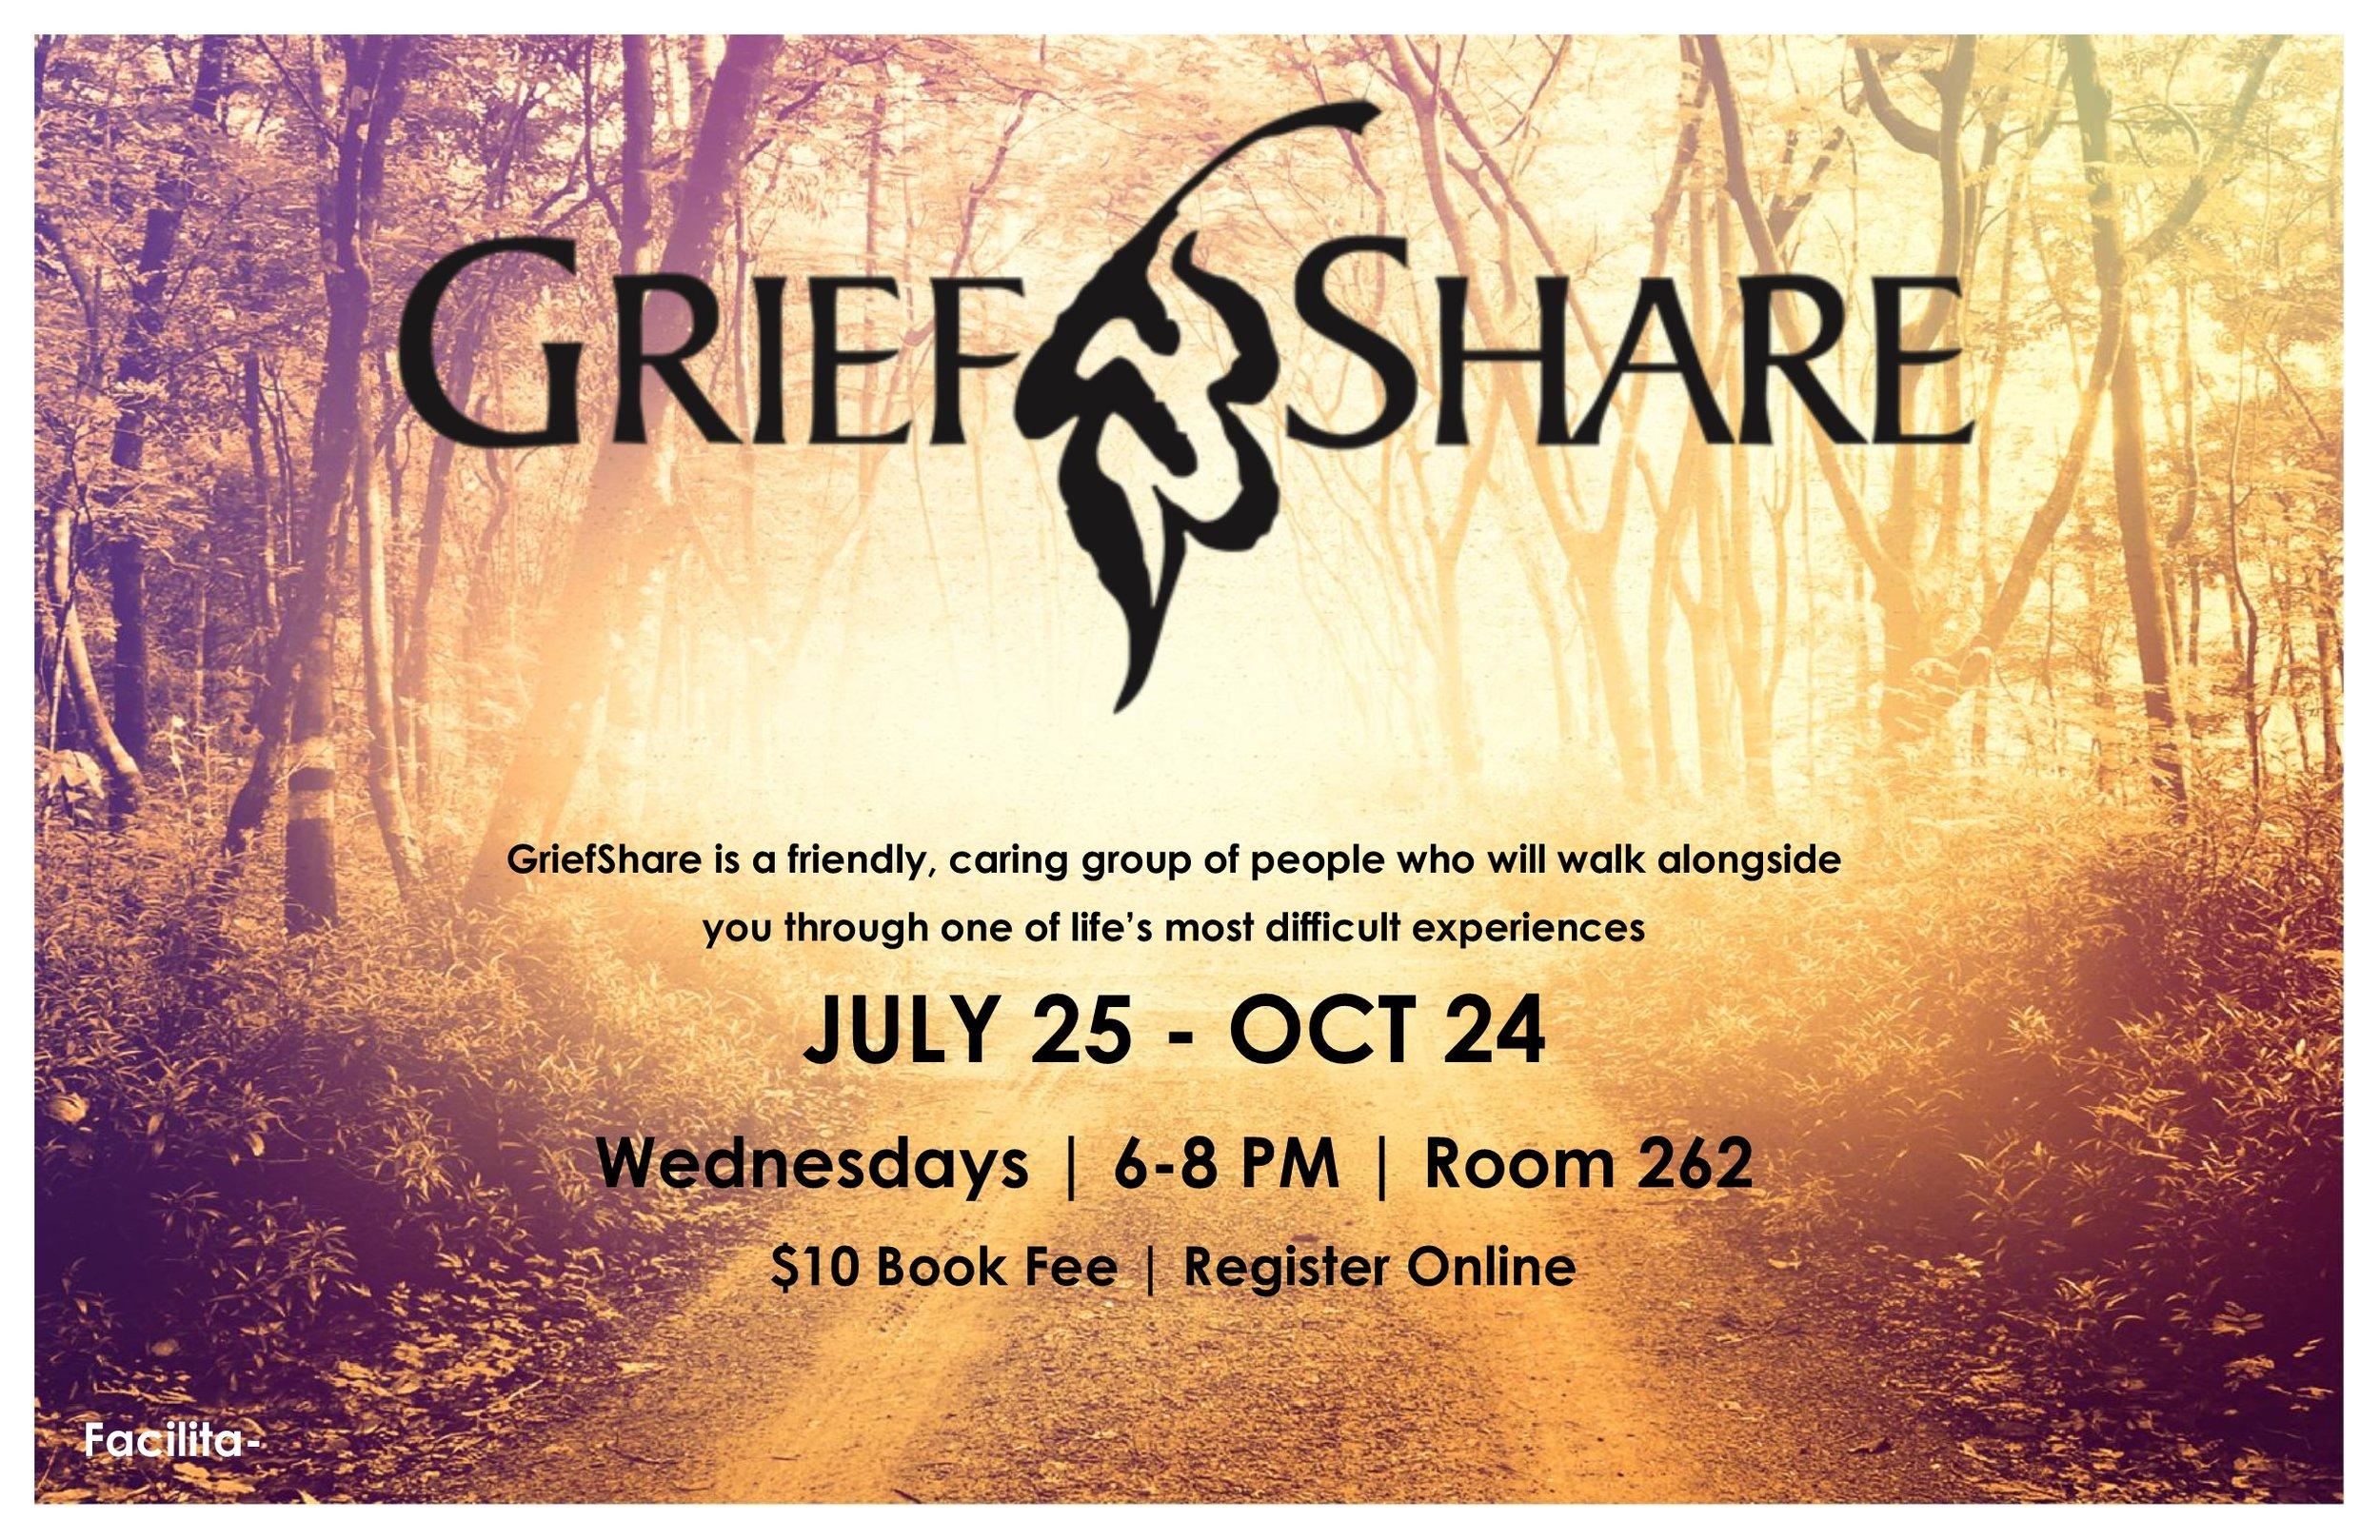 GriefShare Poster.jpg